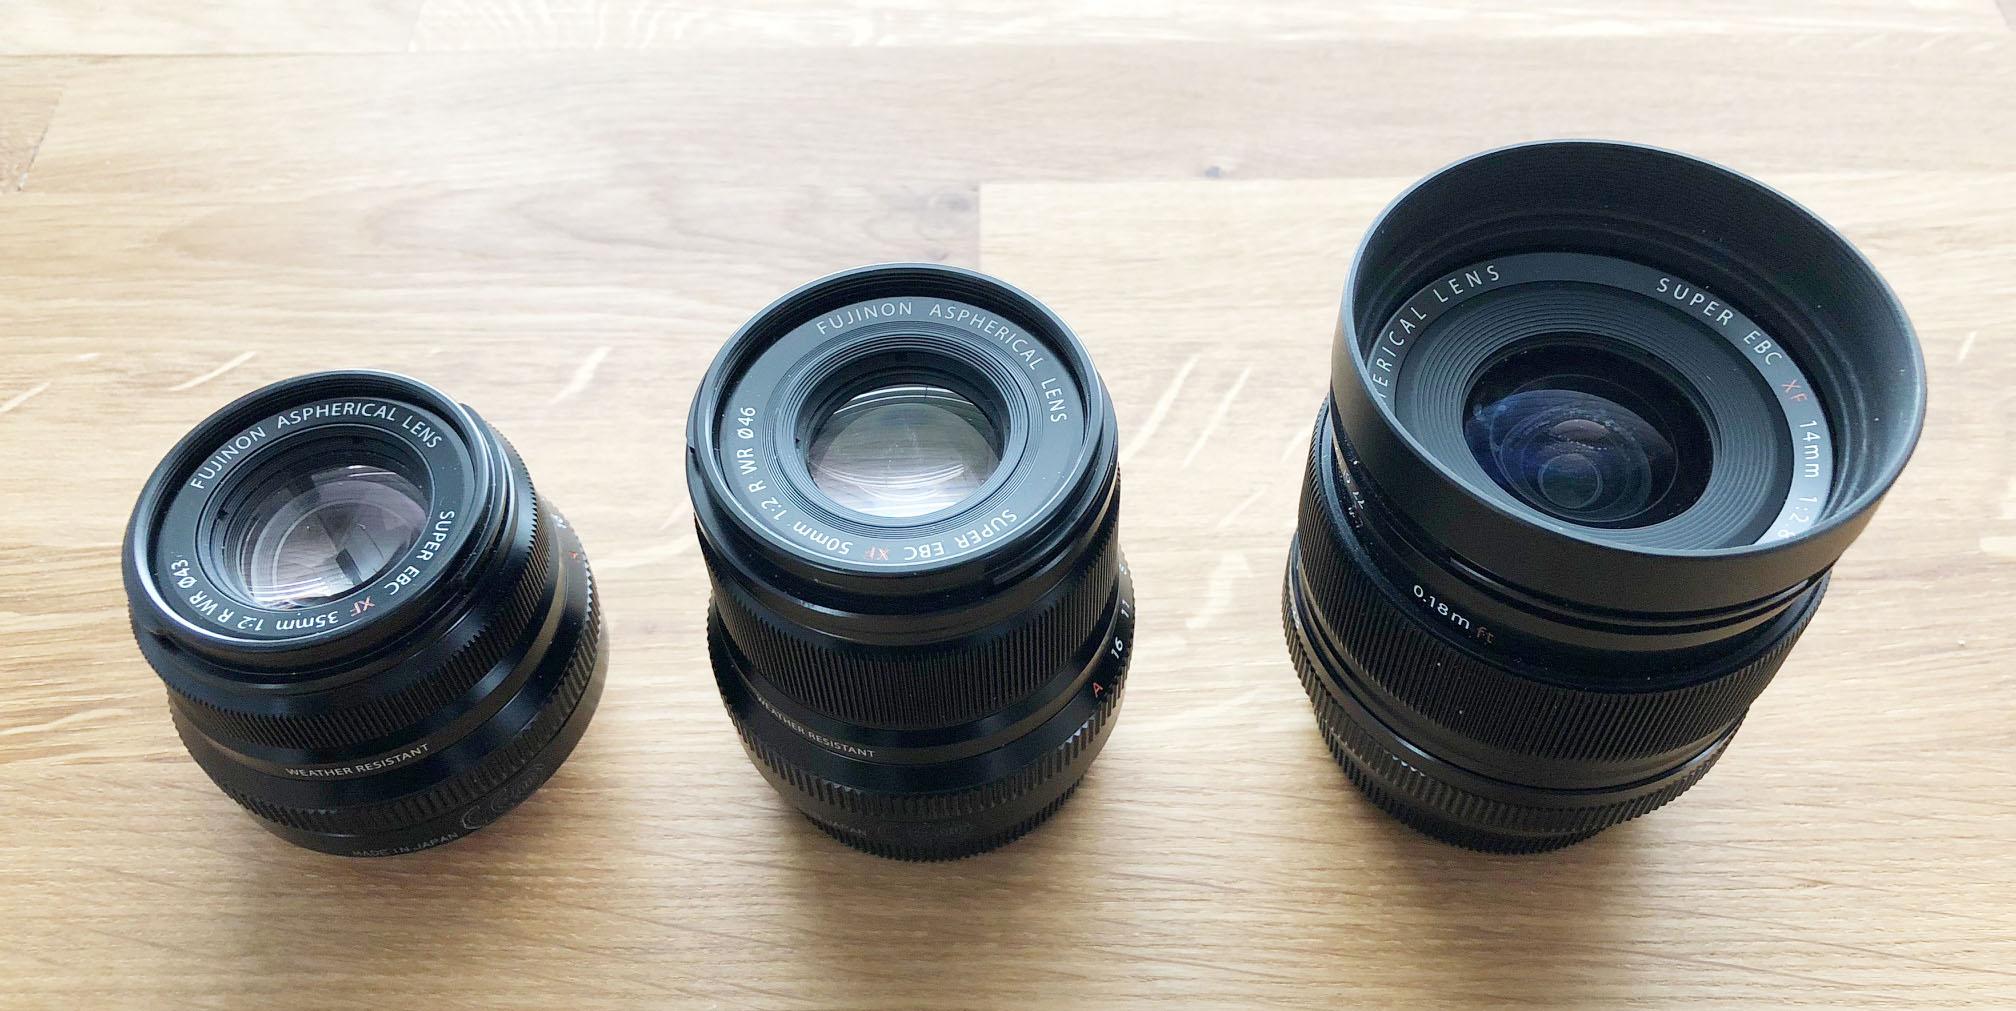 Fujifilm 35mm F2 WR, 50mm F2 WR, 14mm F2.8